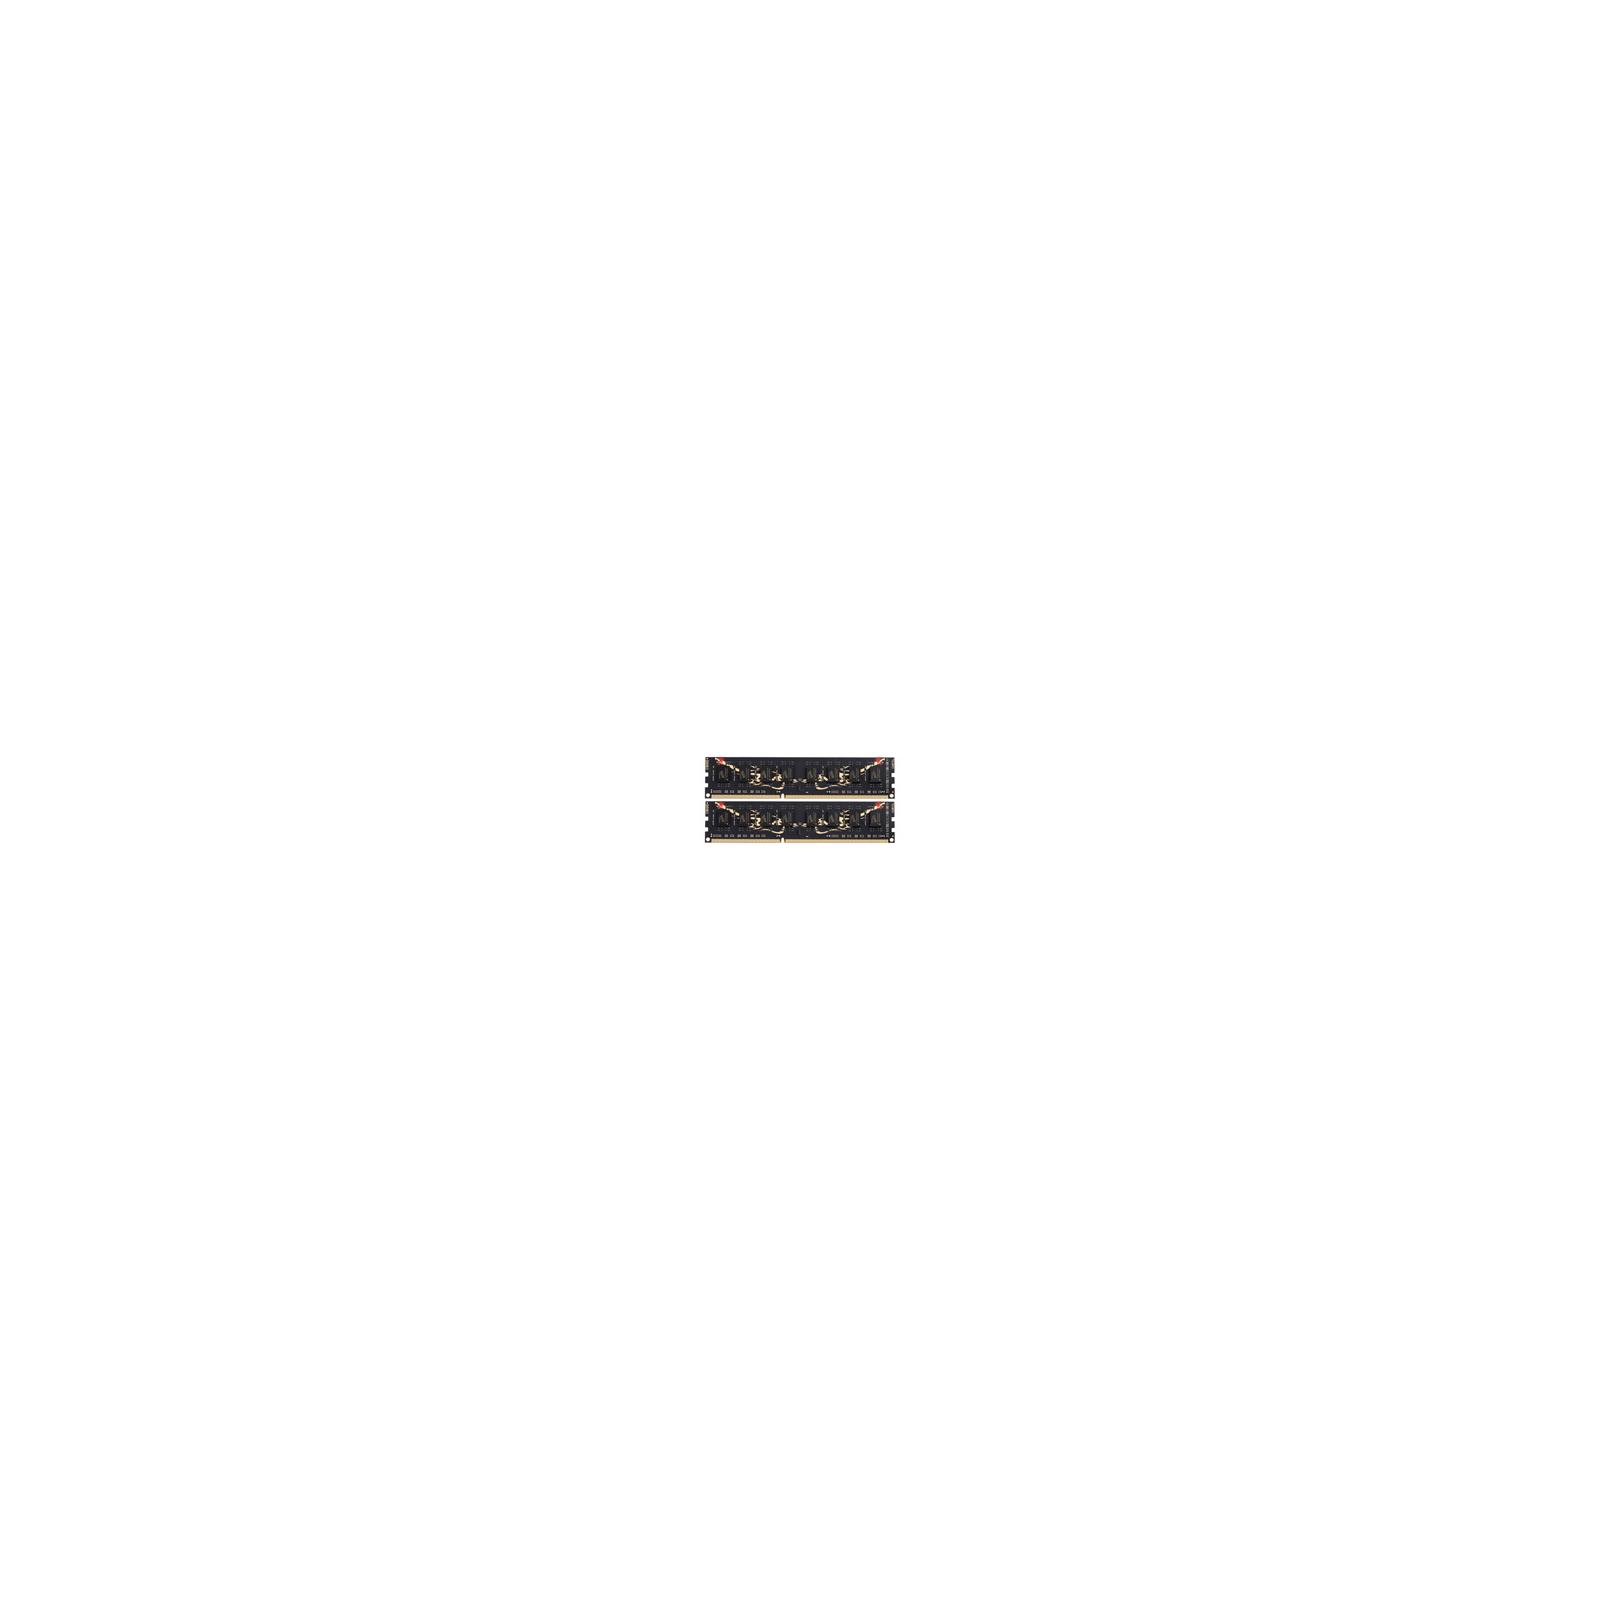 Модуль памяти для компьютера DDR3 4GB (2x2GB) 1600 MHz GEIL (GB34GB1600C8DC)